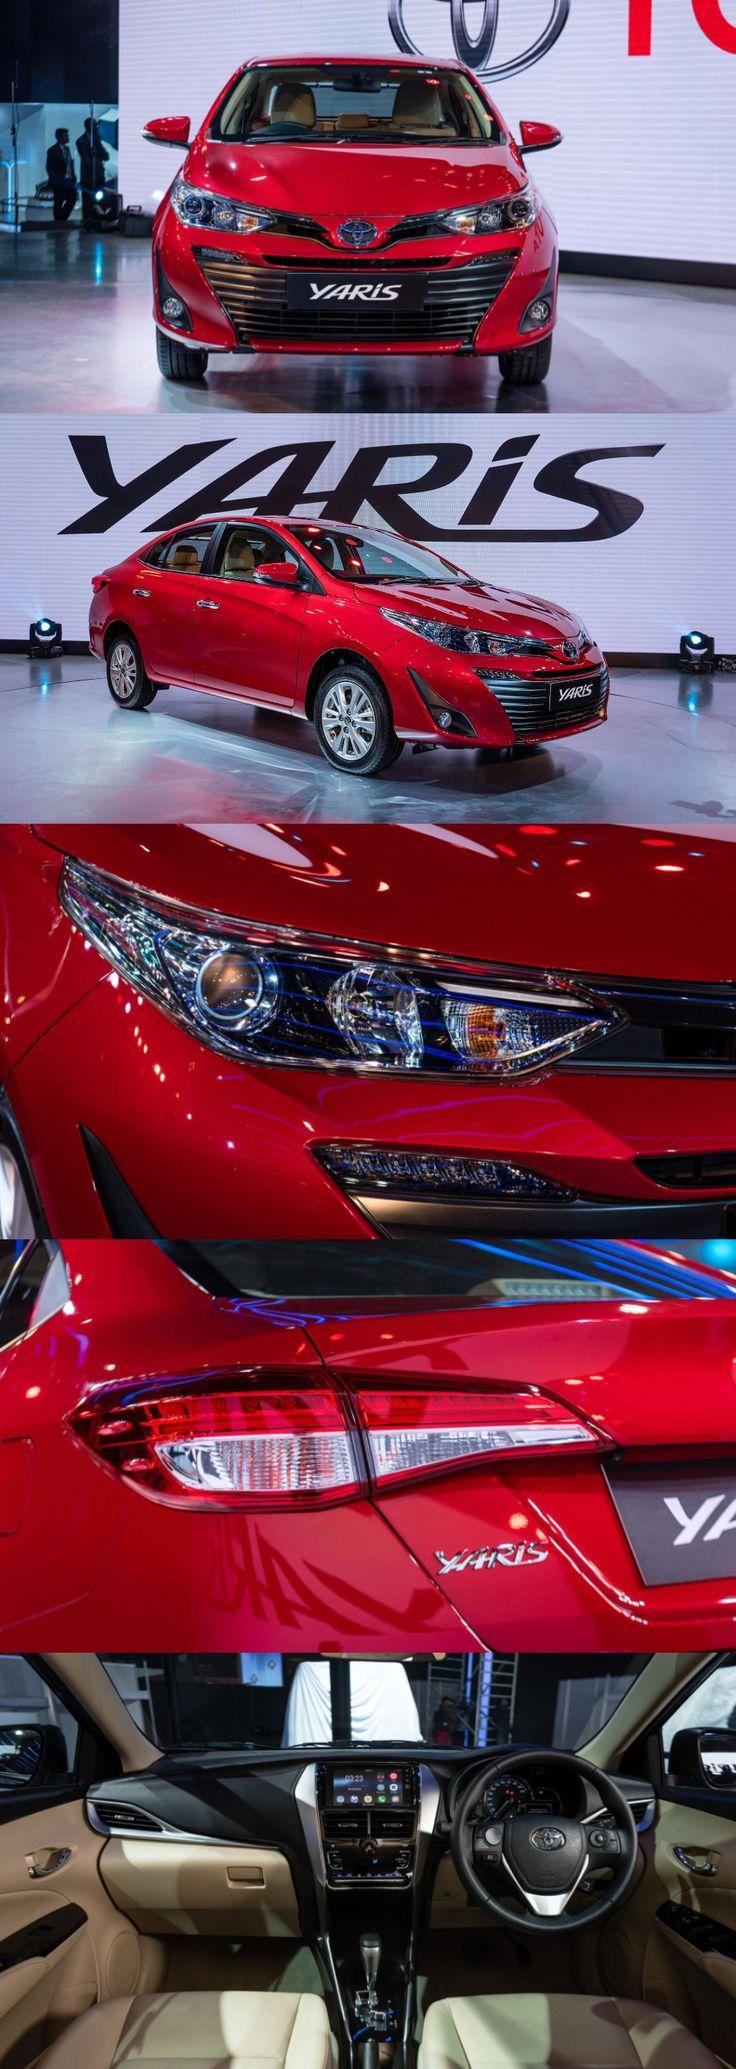 Toyota Yaris Sedan To Launch On 24 April 2018 In India